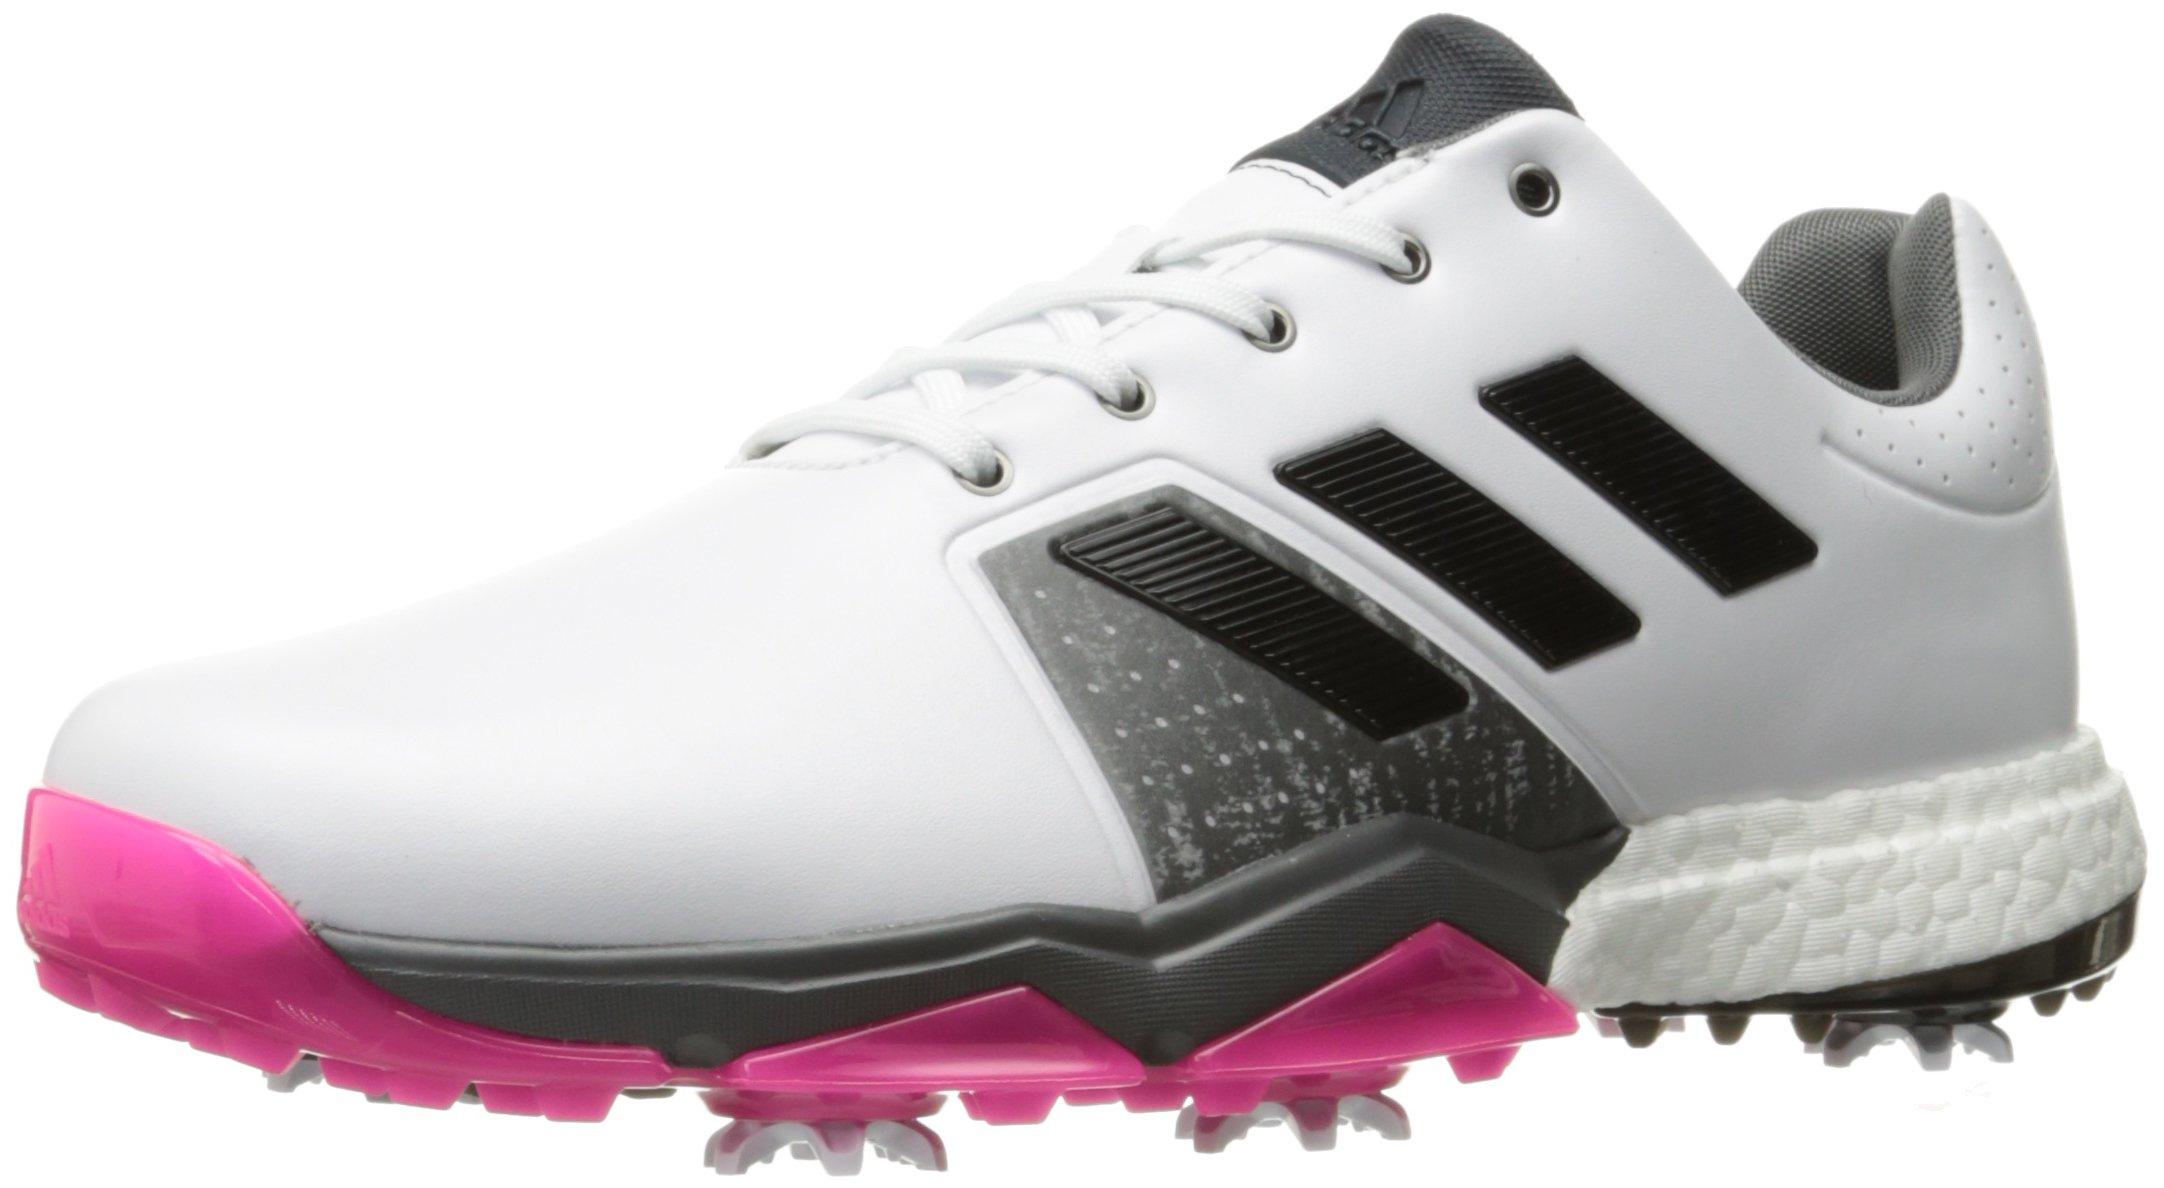 adidas Men's Adipower Boost 3 WD Golf Shoe, White/Black/Shock Pink, 7.5 W US